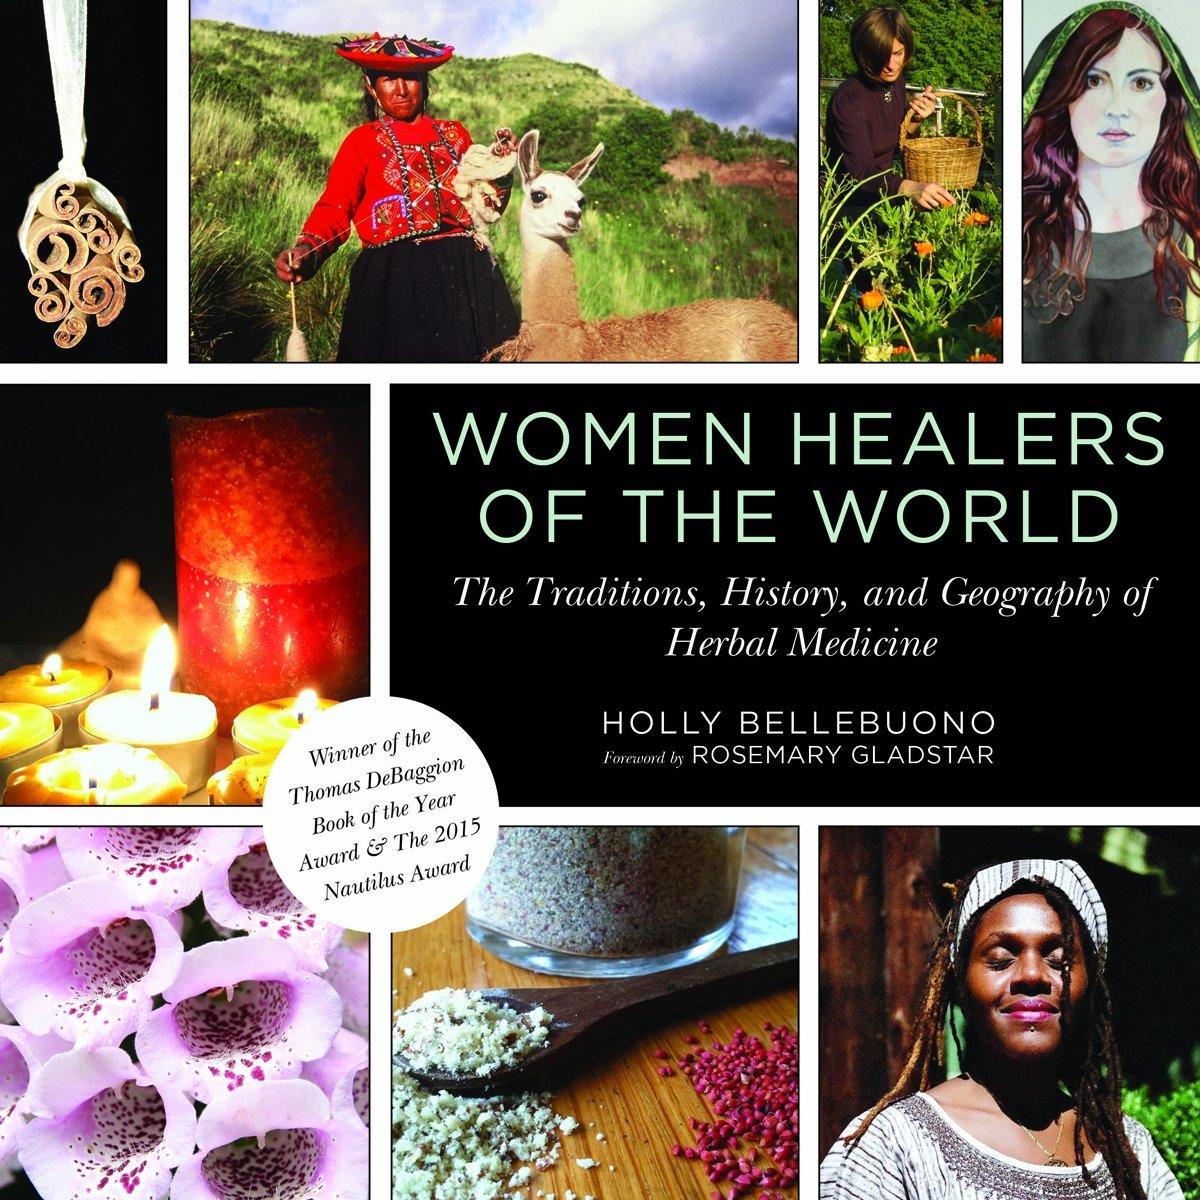 women healers of the world.jpg